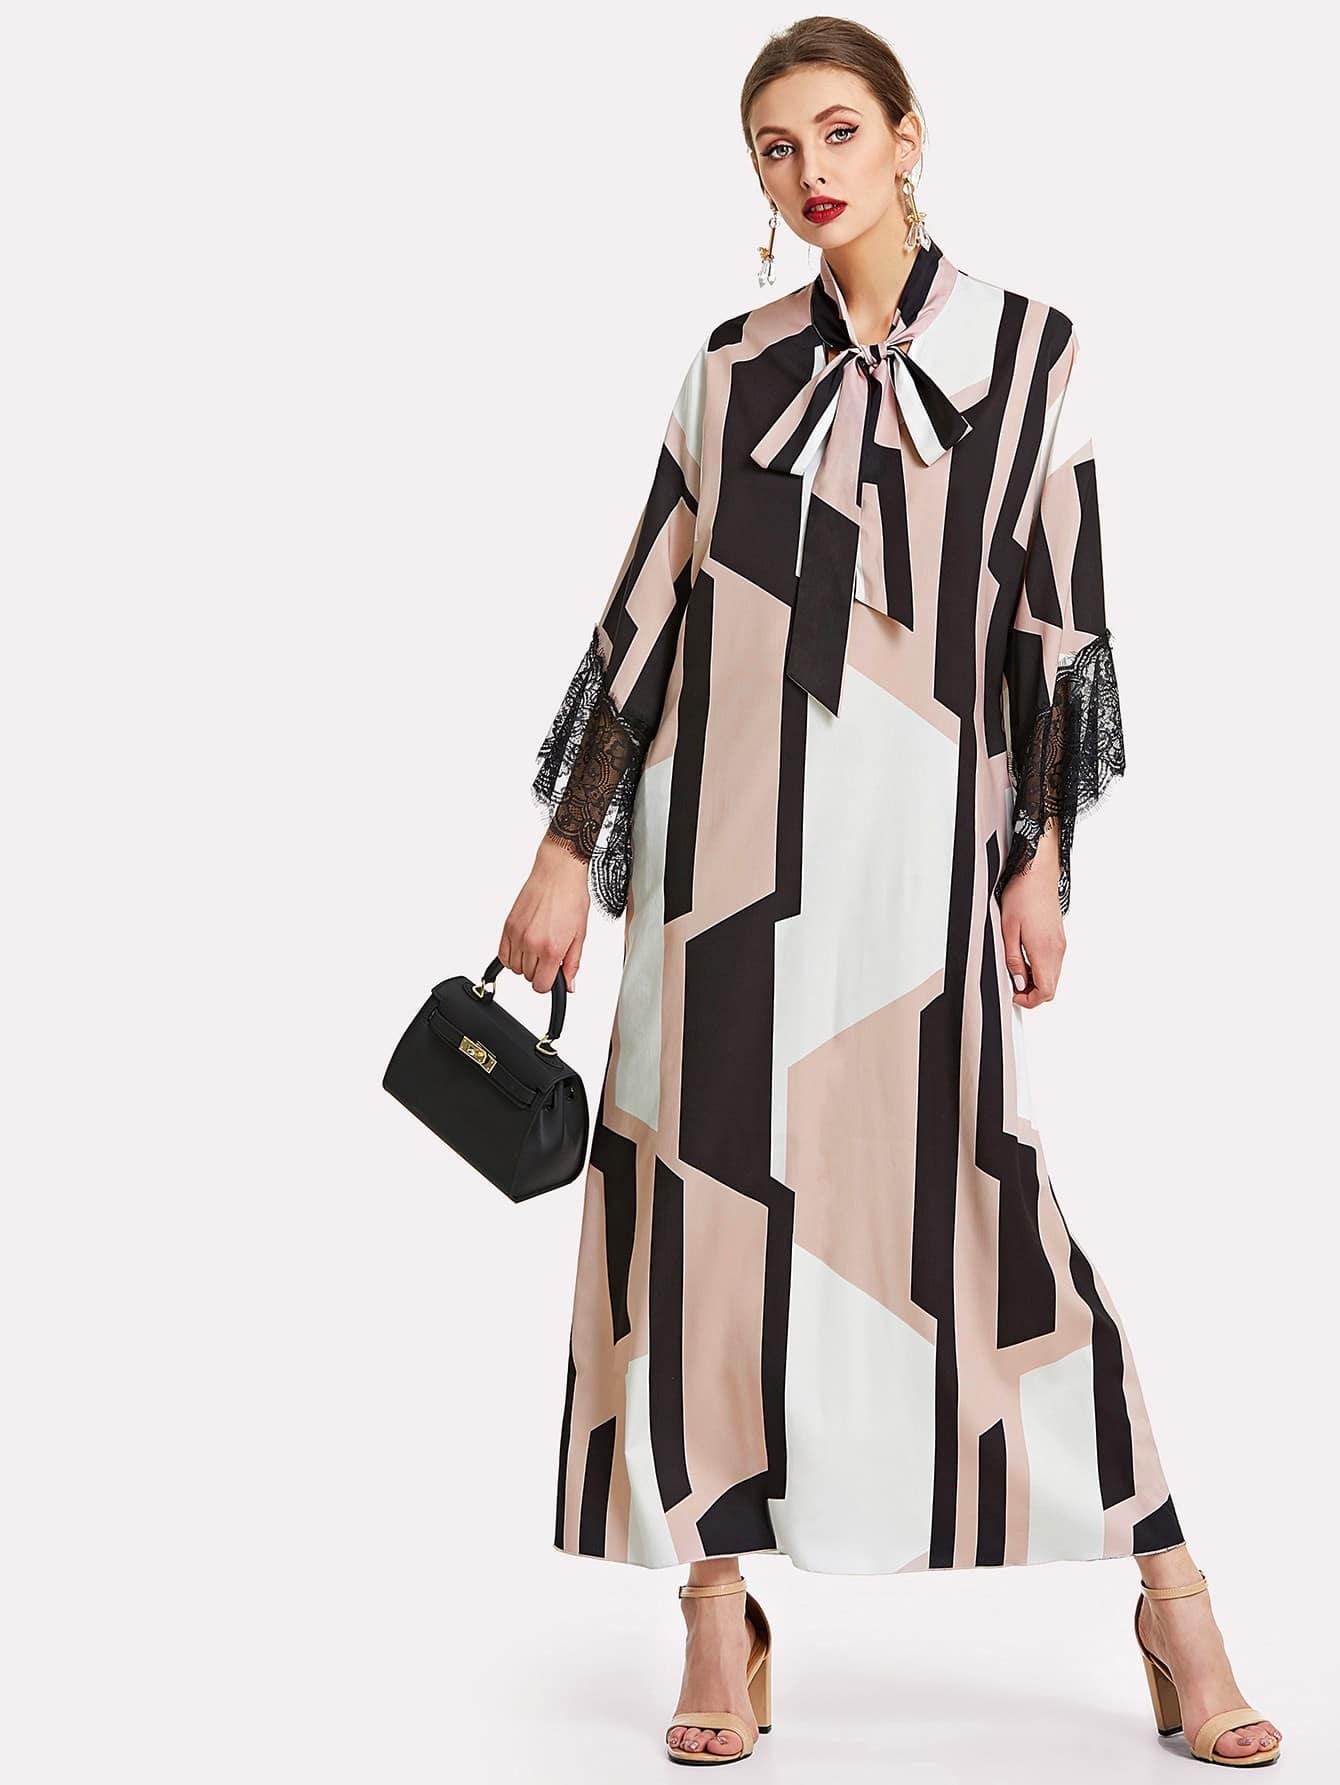 Contrast Lace Tied Neck Geo Hijab Dress tied neck geo print flare dress